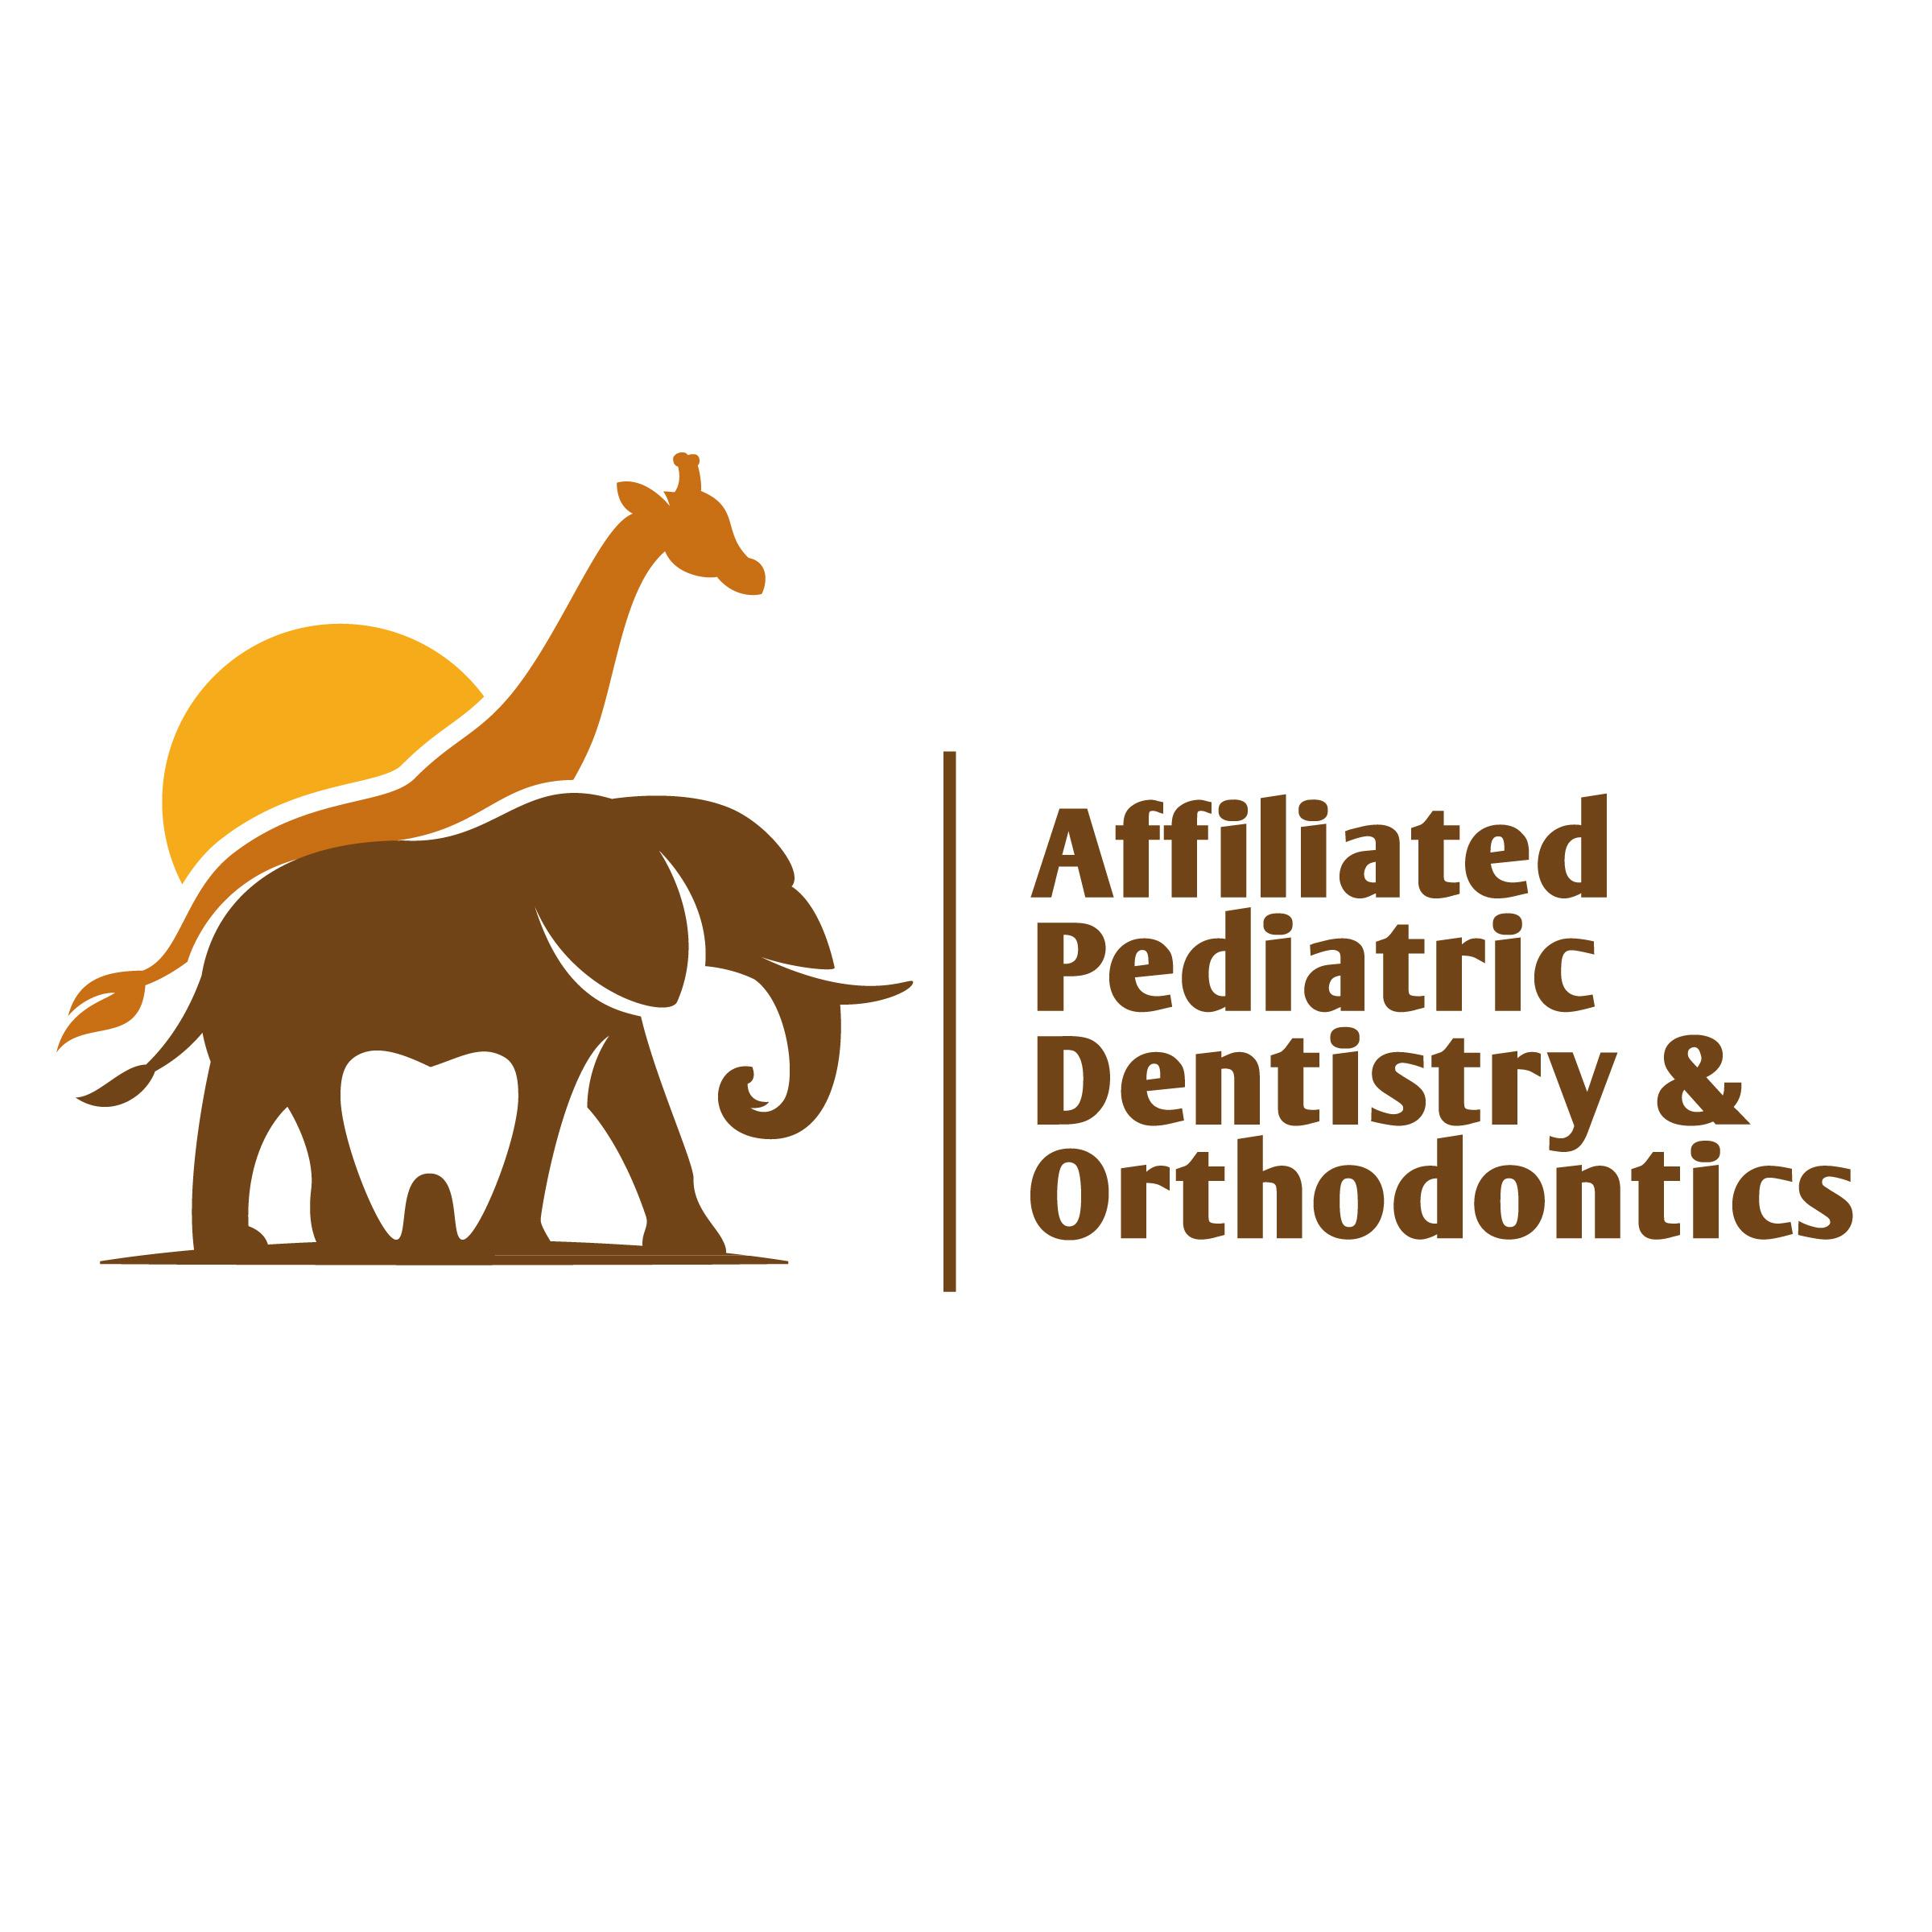 Affiliated Pediatric Dentistry & Orthodontics: Scottsdale Shea